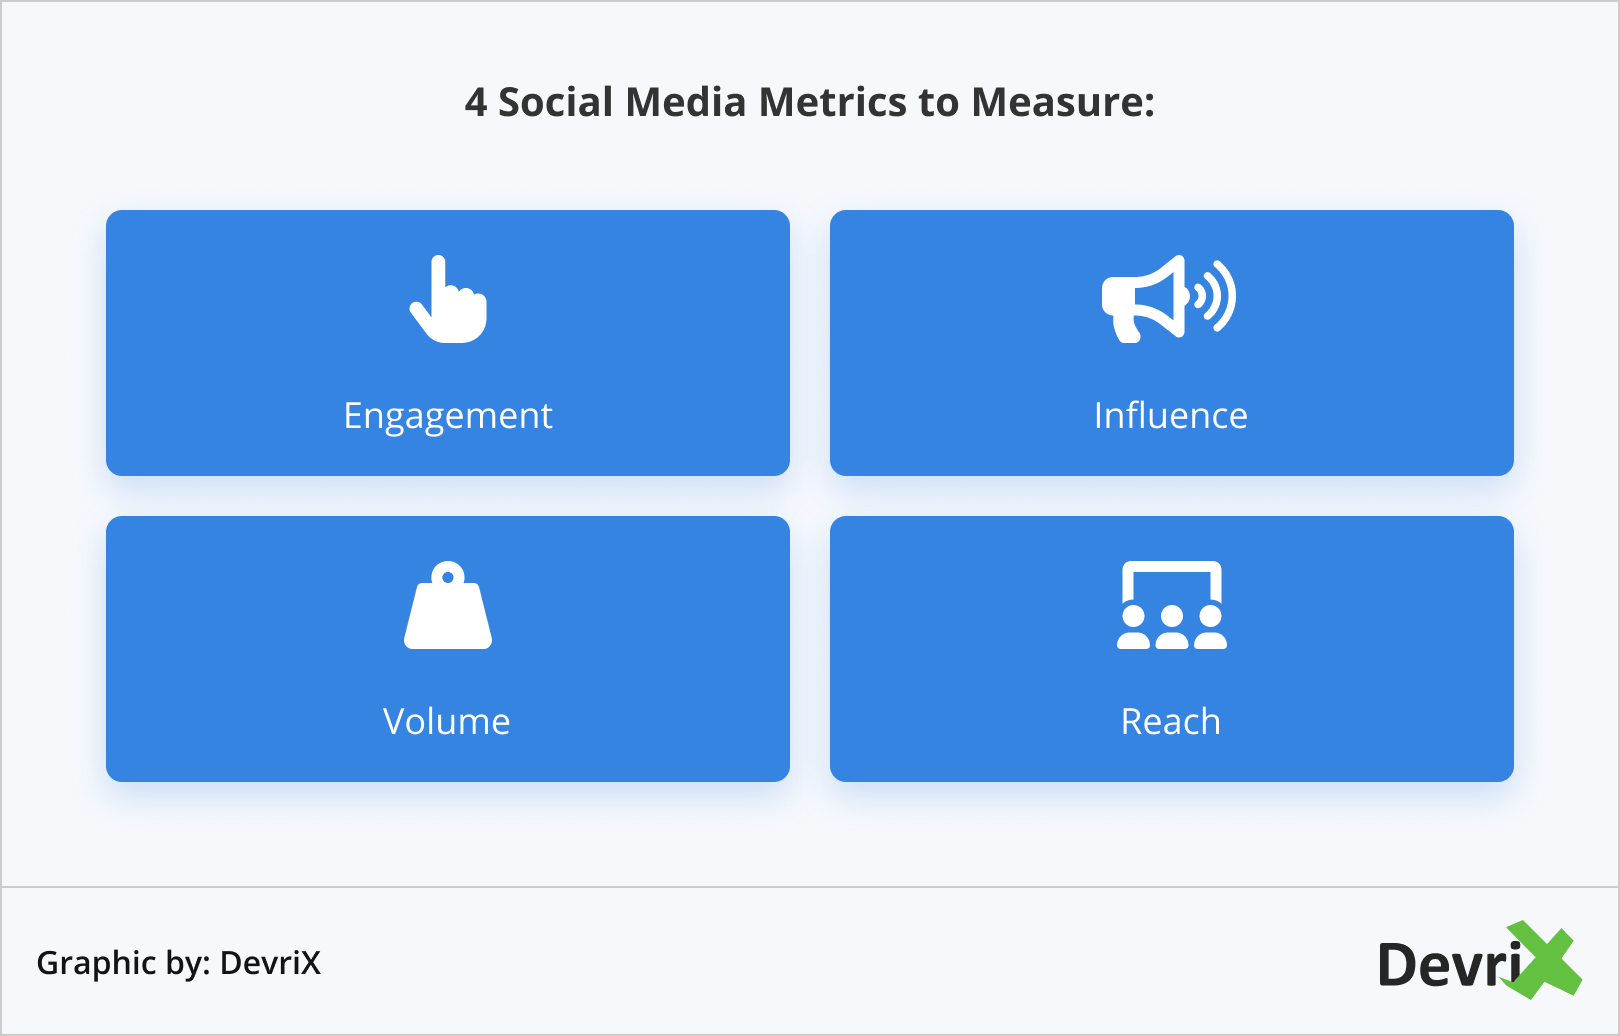 4 Social Media Metrics to Measure